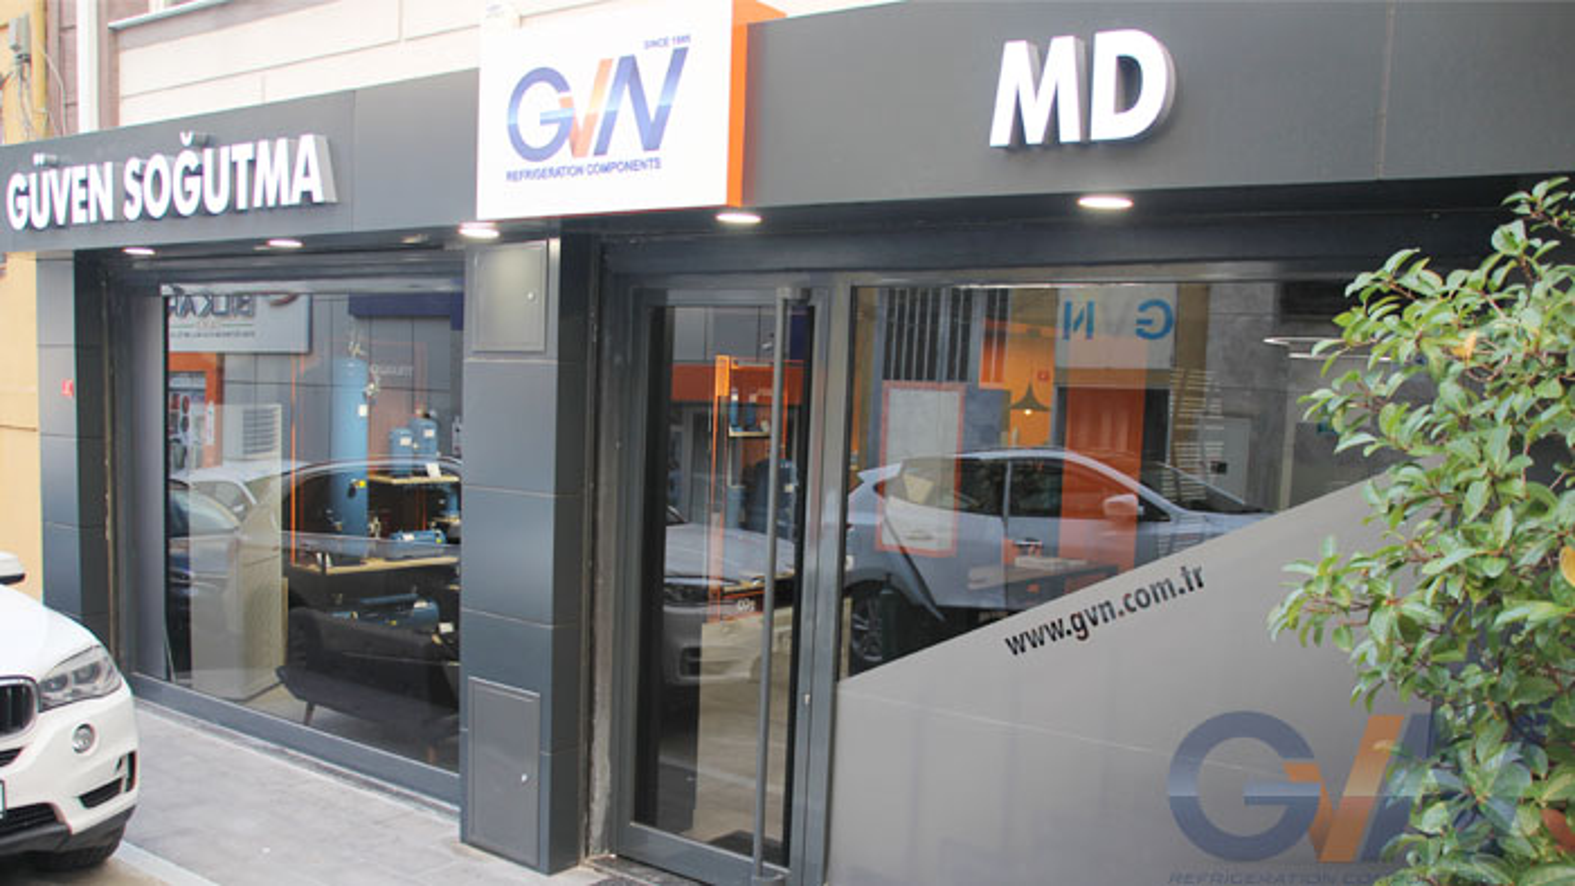 GVN REFRIGERATION COMPONENTS; GÜVEN SOĞUTMA; MD